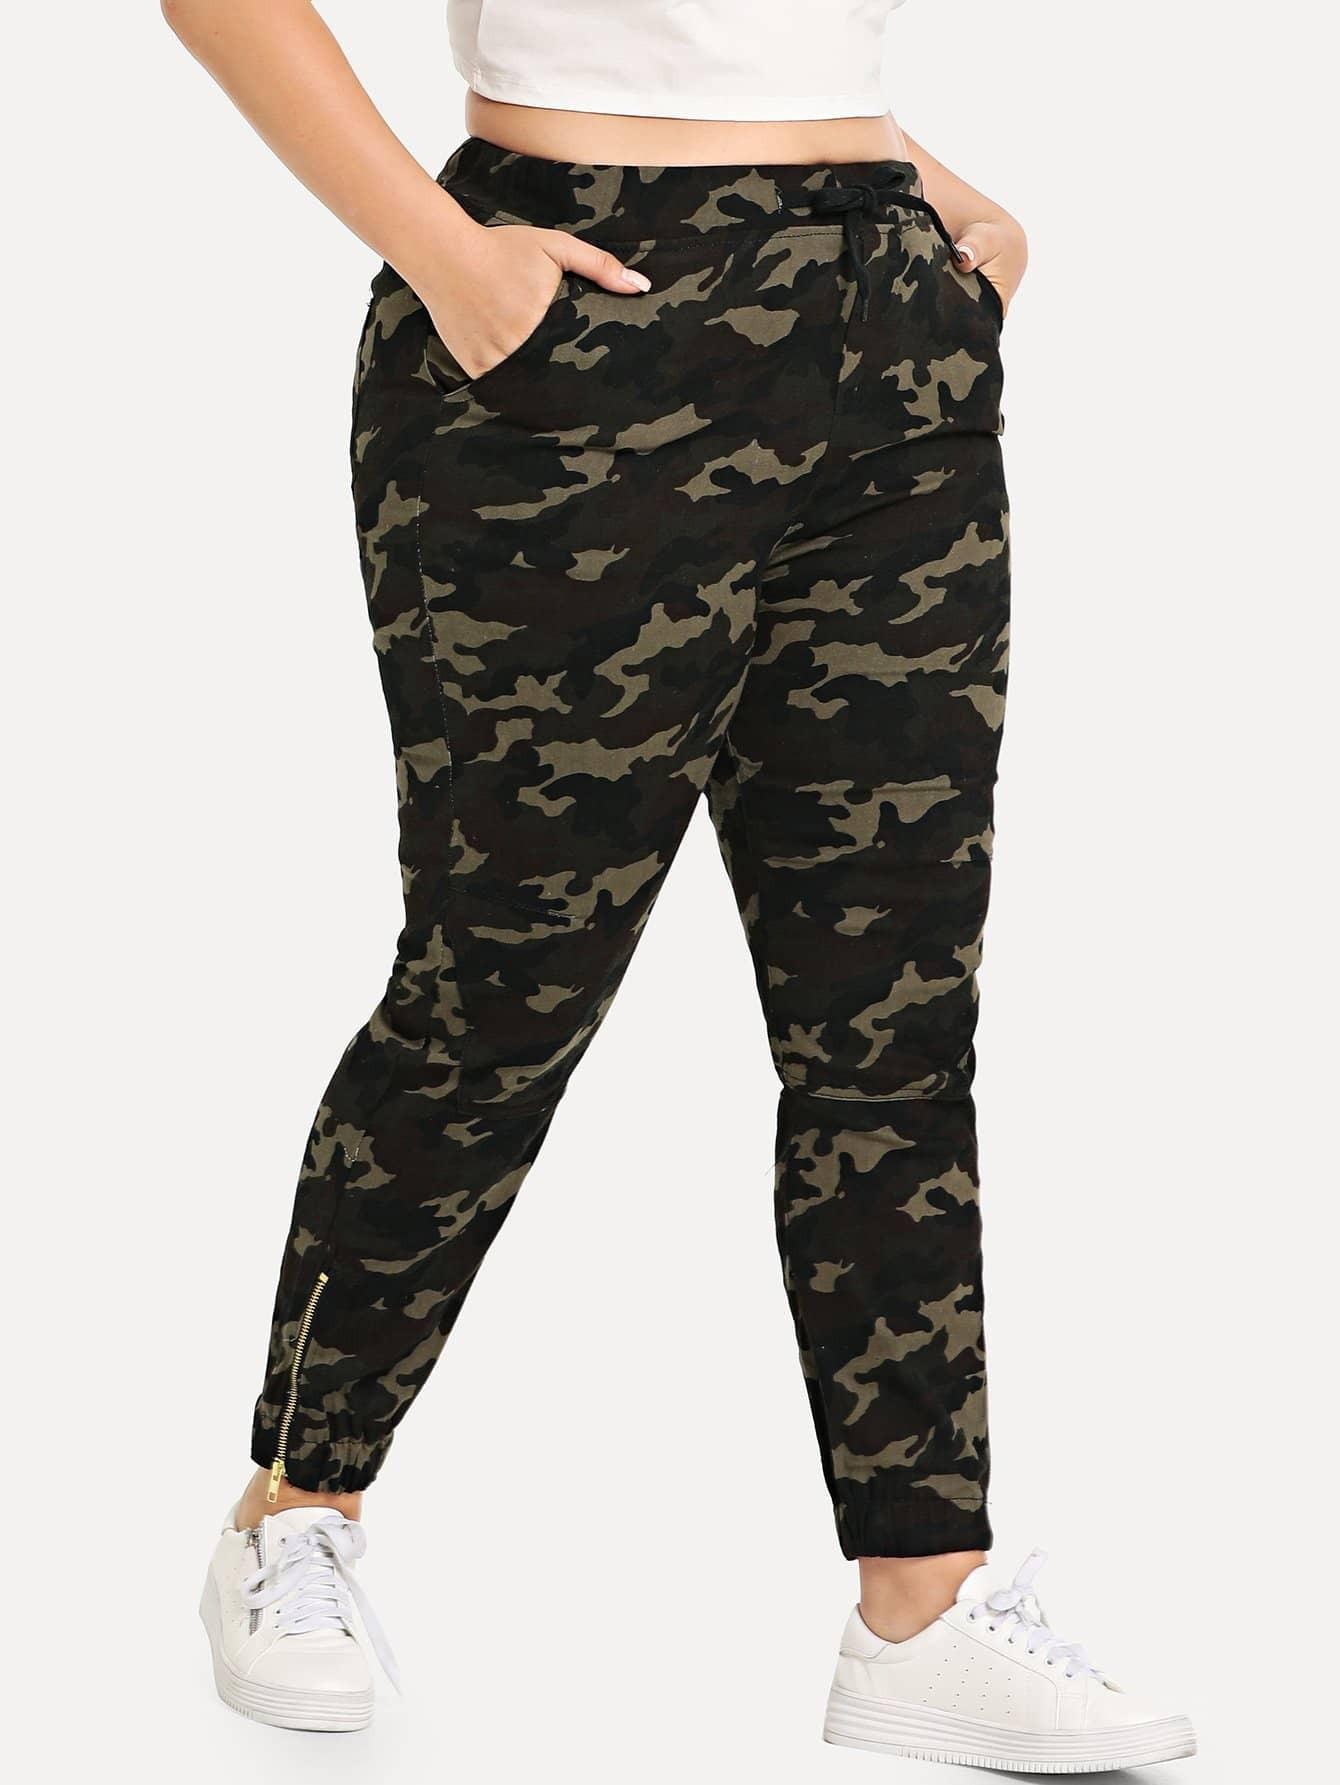 Купить Drawstring Талия Camo Zip Side Jeans, Franziska, SheIn